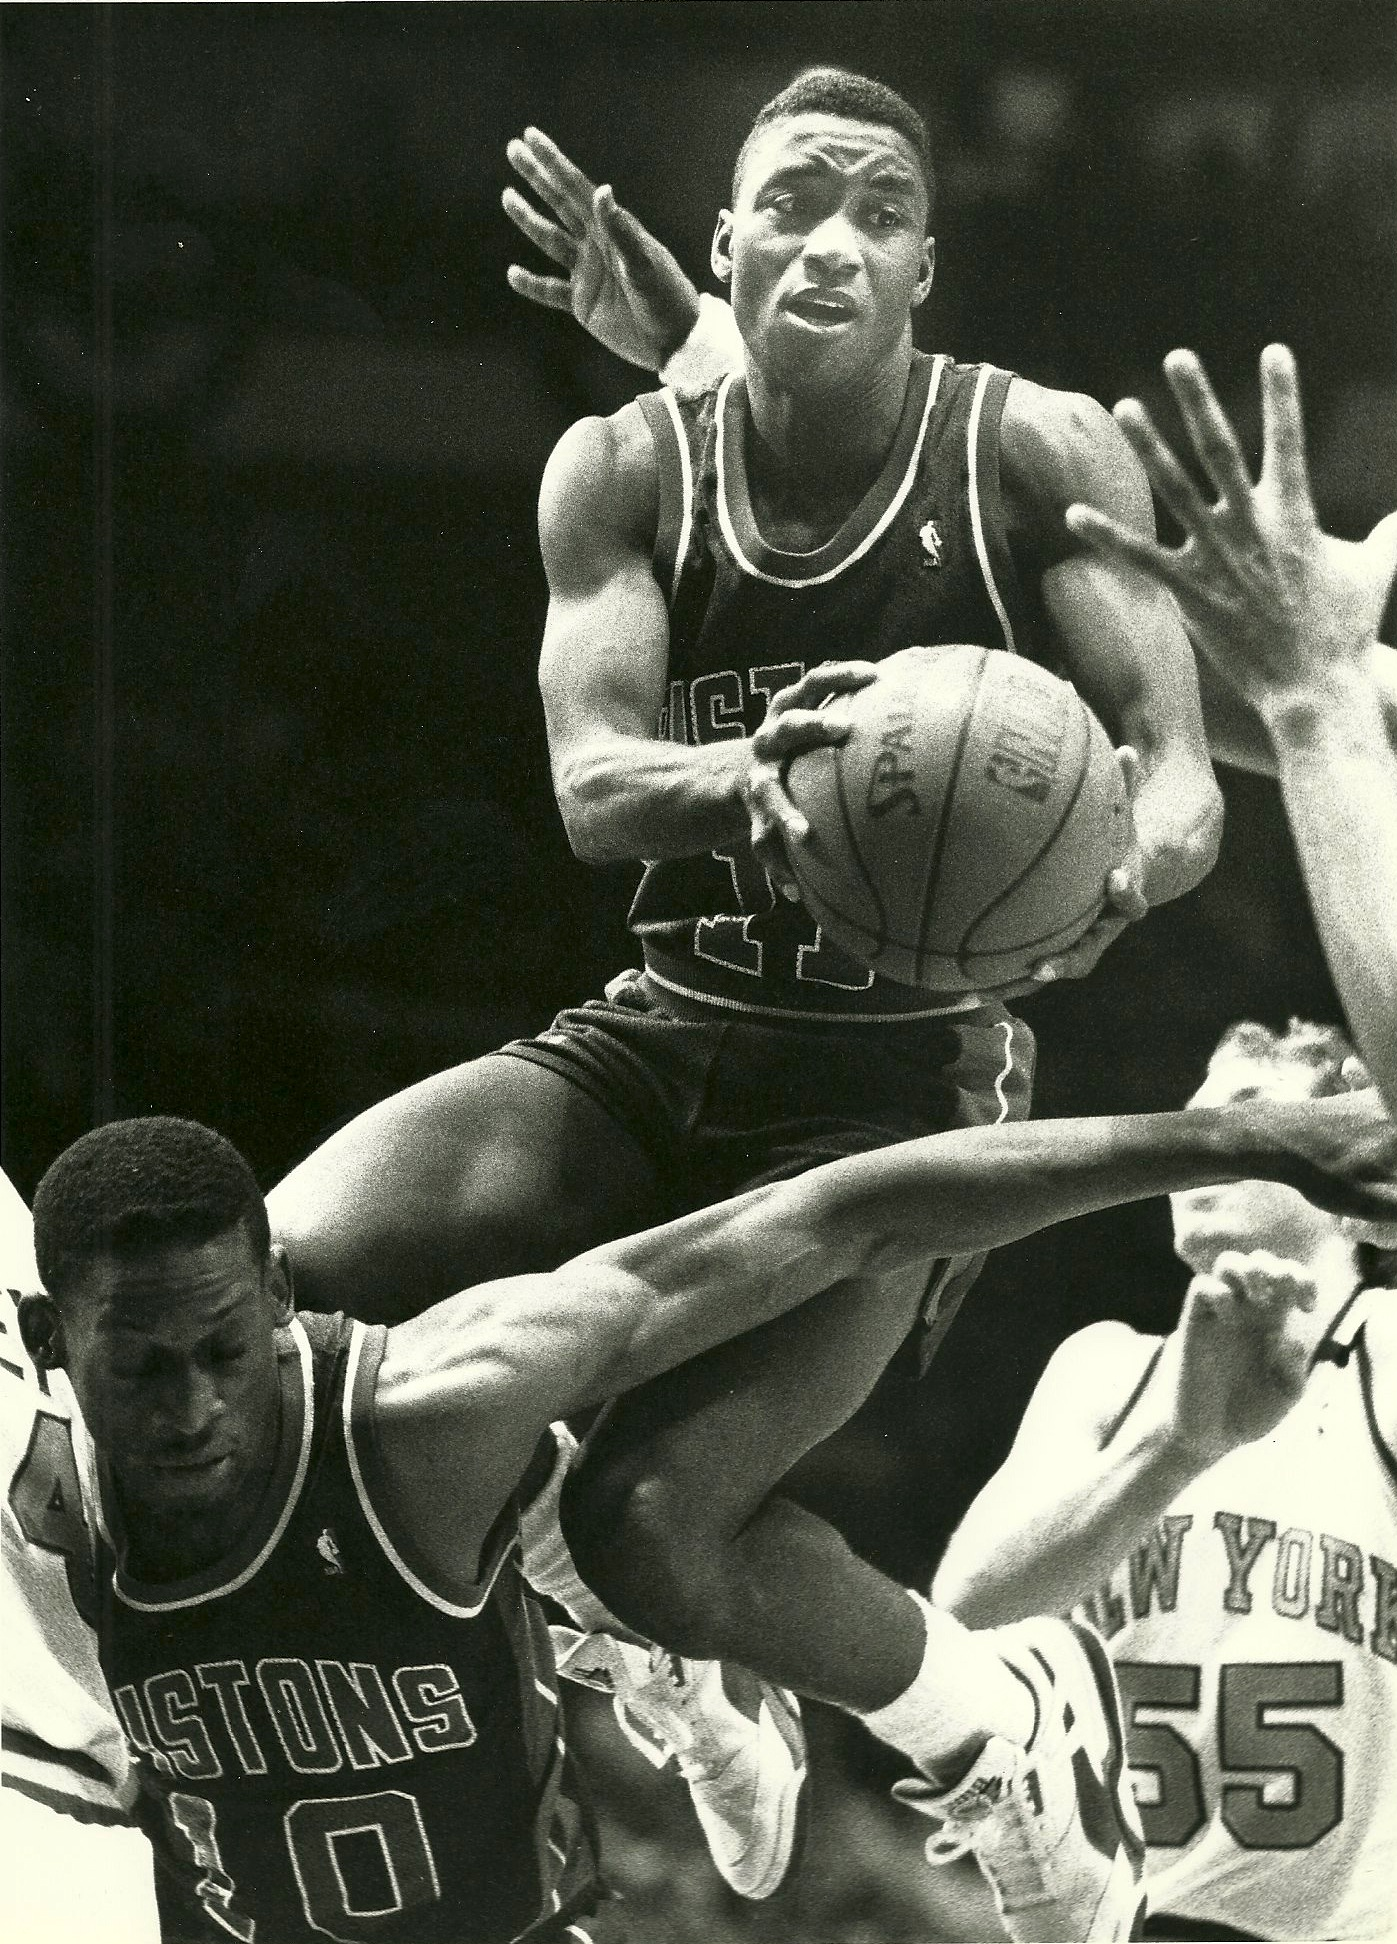 Isaiah Thomas looks to pass while taking a ride on Dennis Rodman's back. Photo copyright Chris S. Cornell.